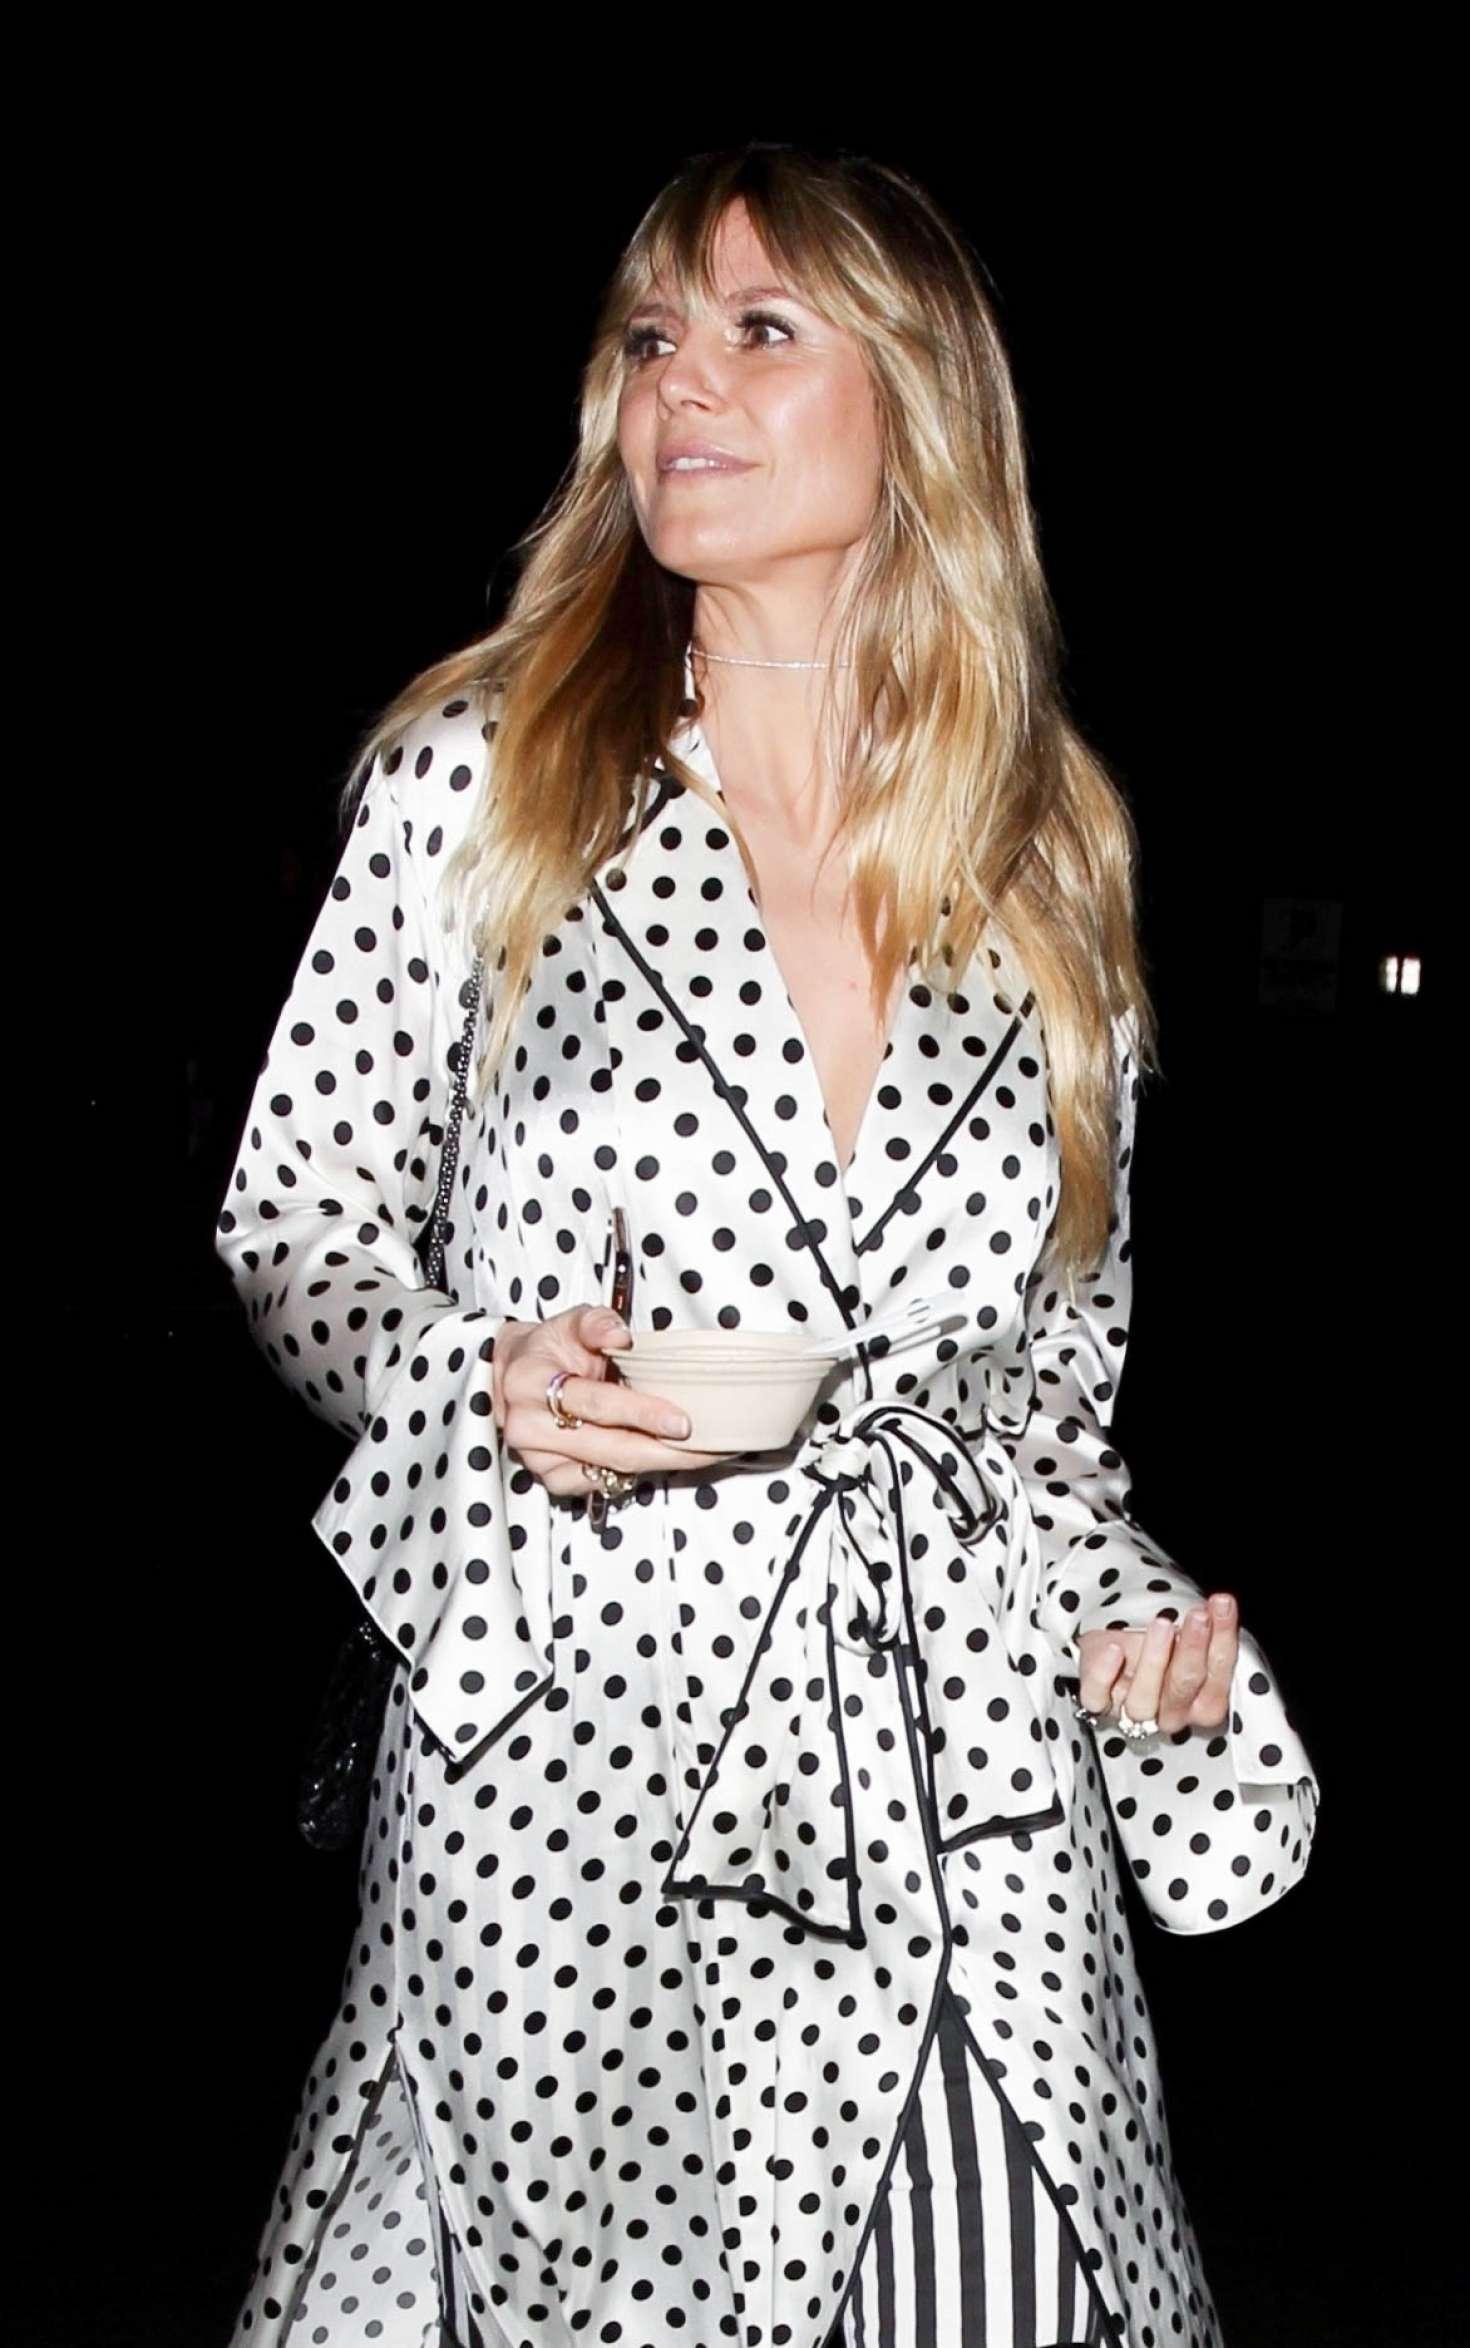 Heidi Klum 2019 : Heidi Klum: Leaves Billie Eilish Album Release Party -03